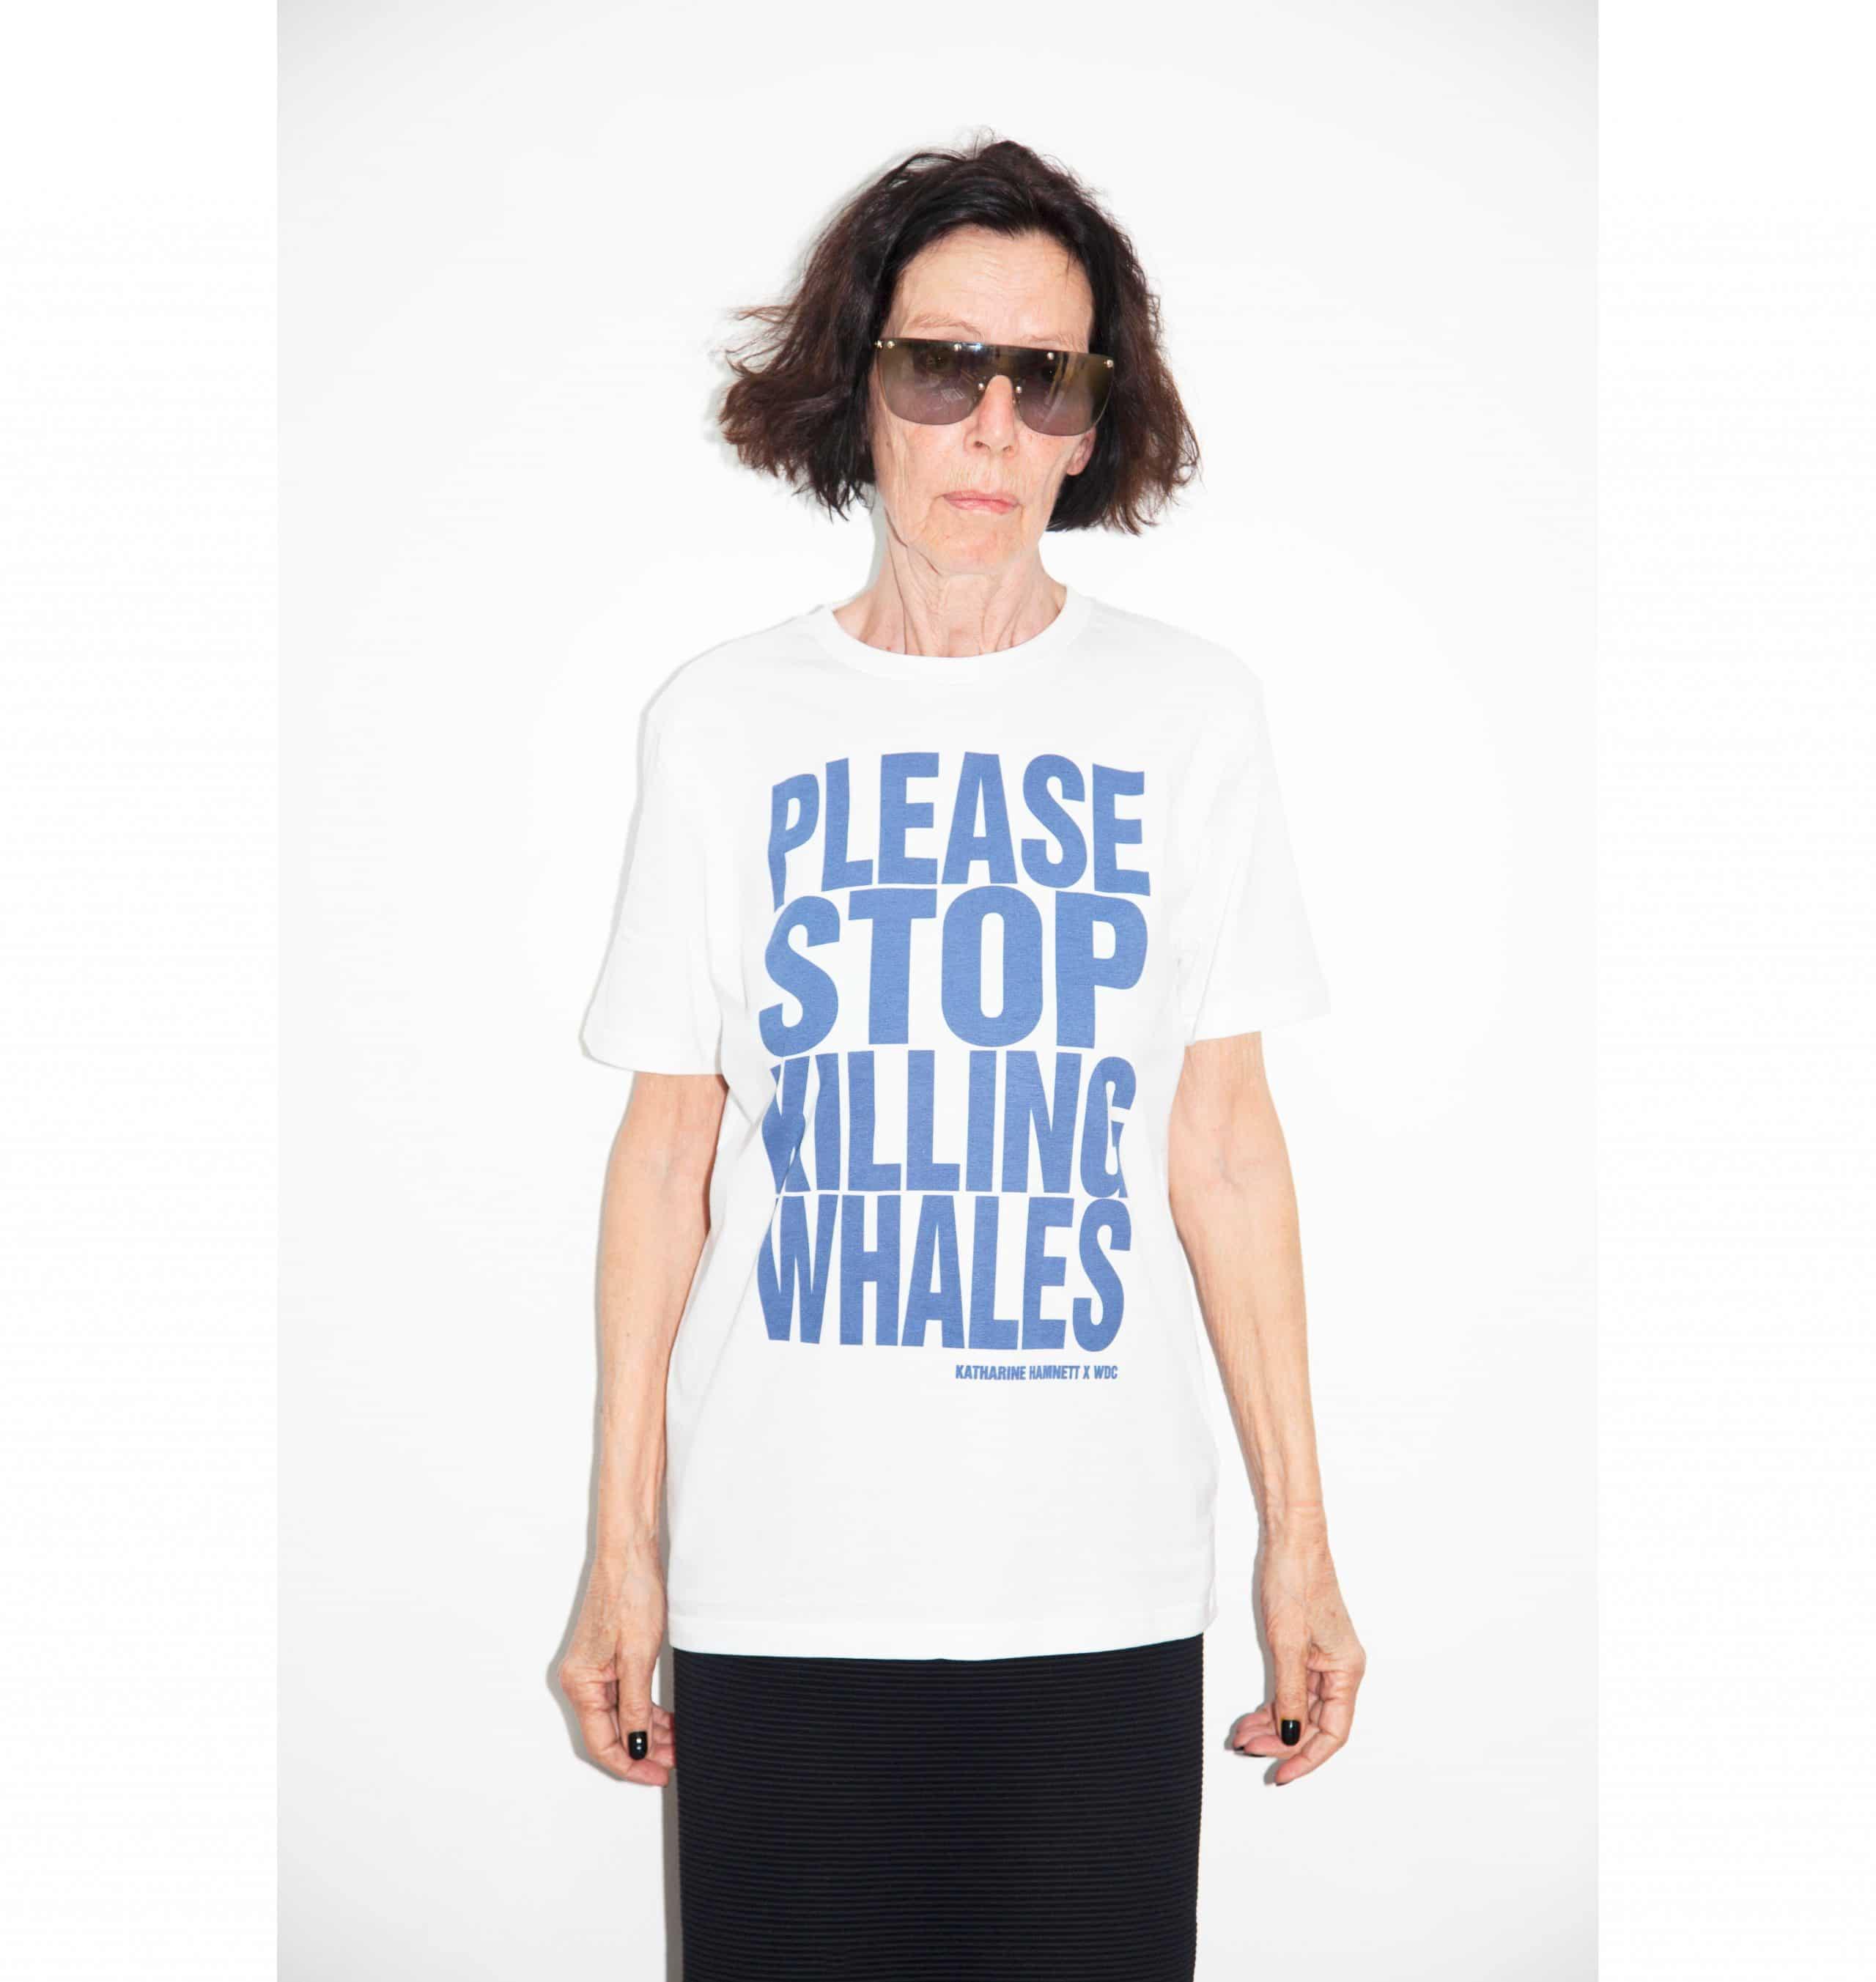 Acclaimed fashion designer Katharine Hamnett joins WDC fight to halt